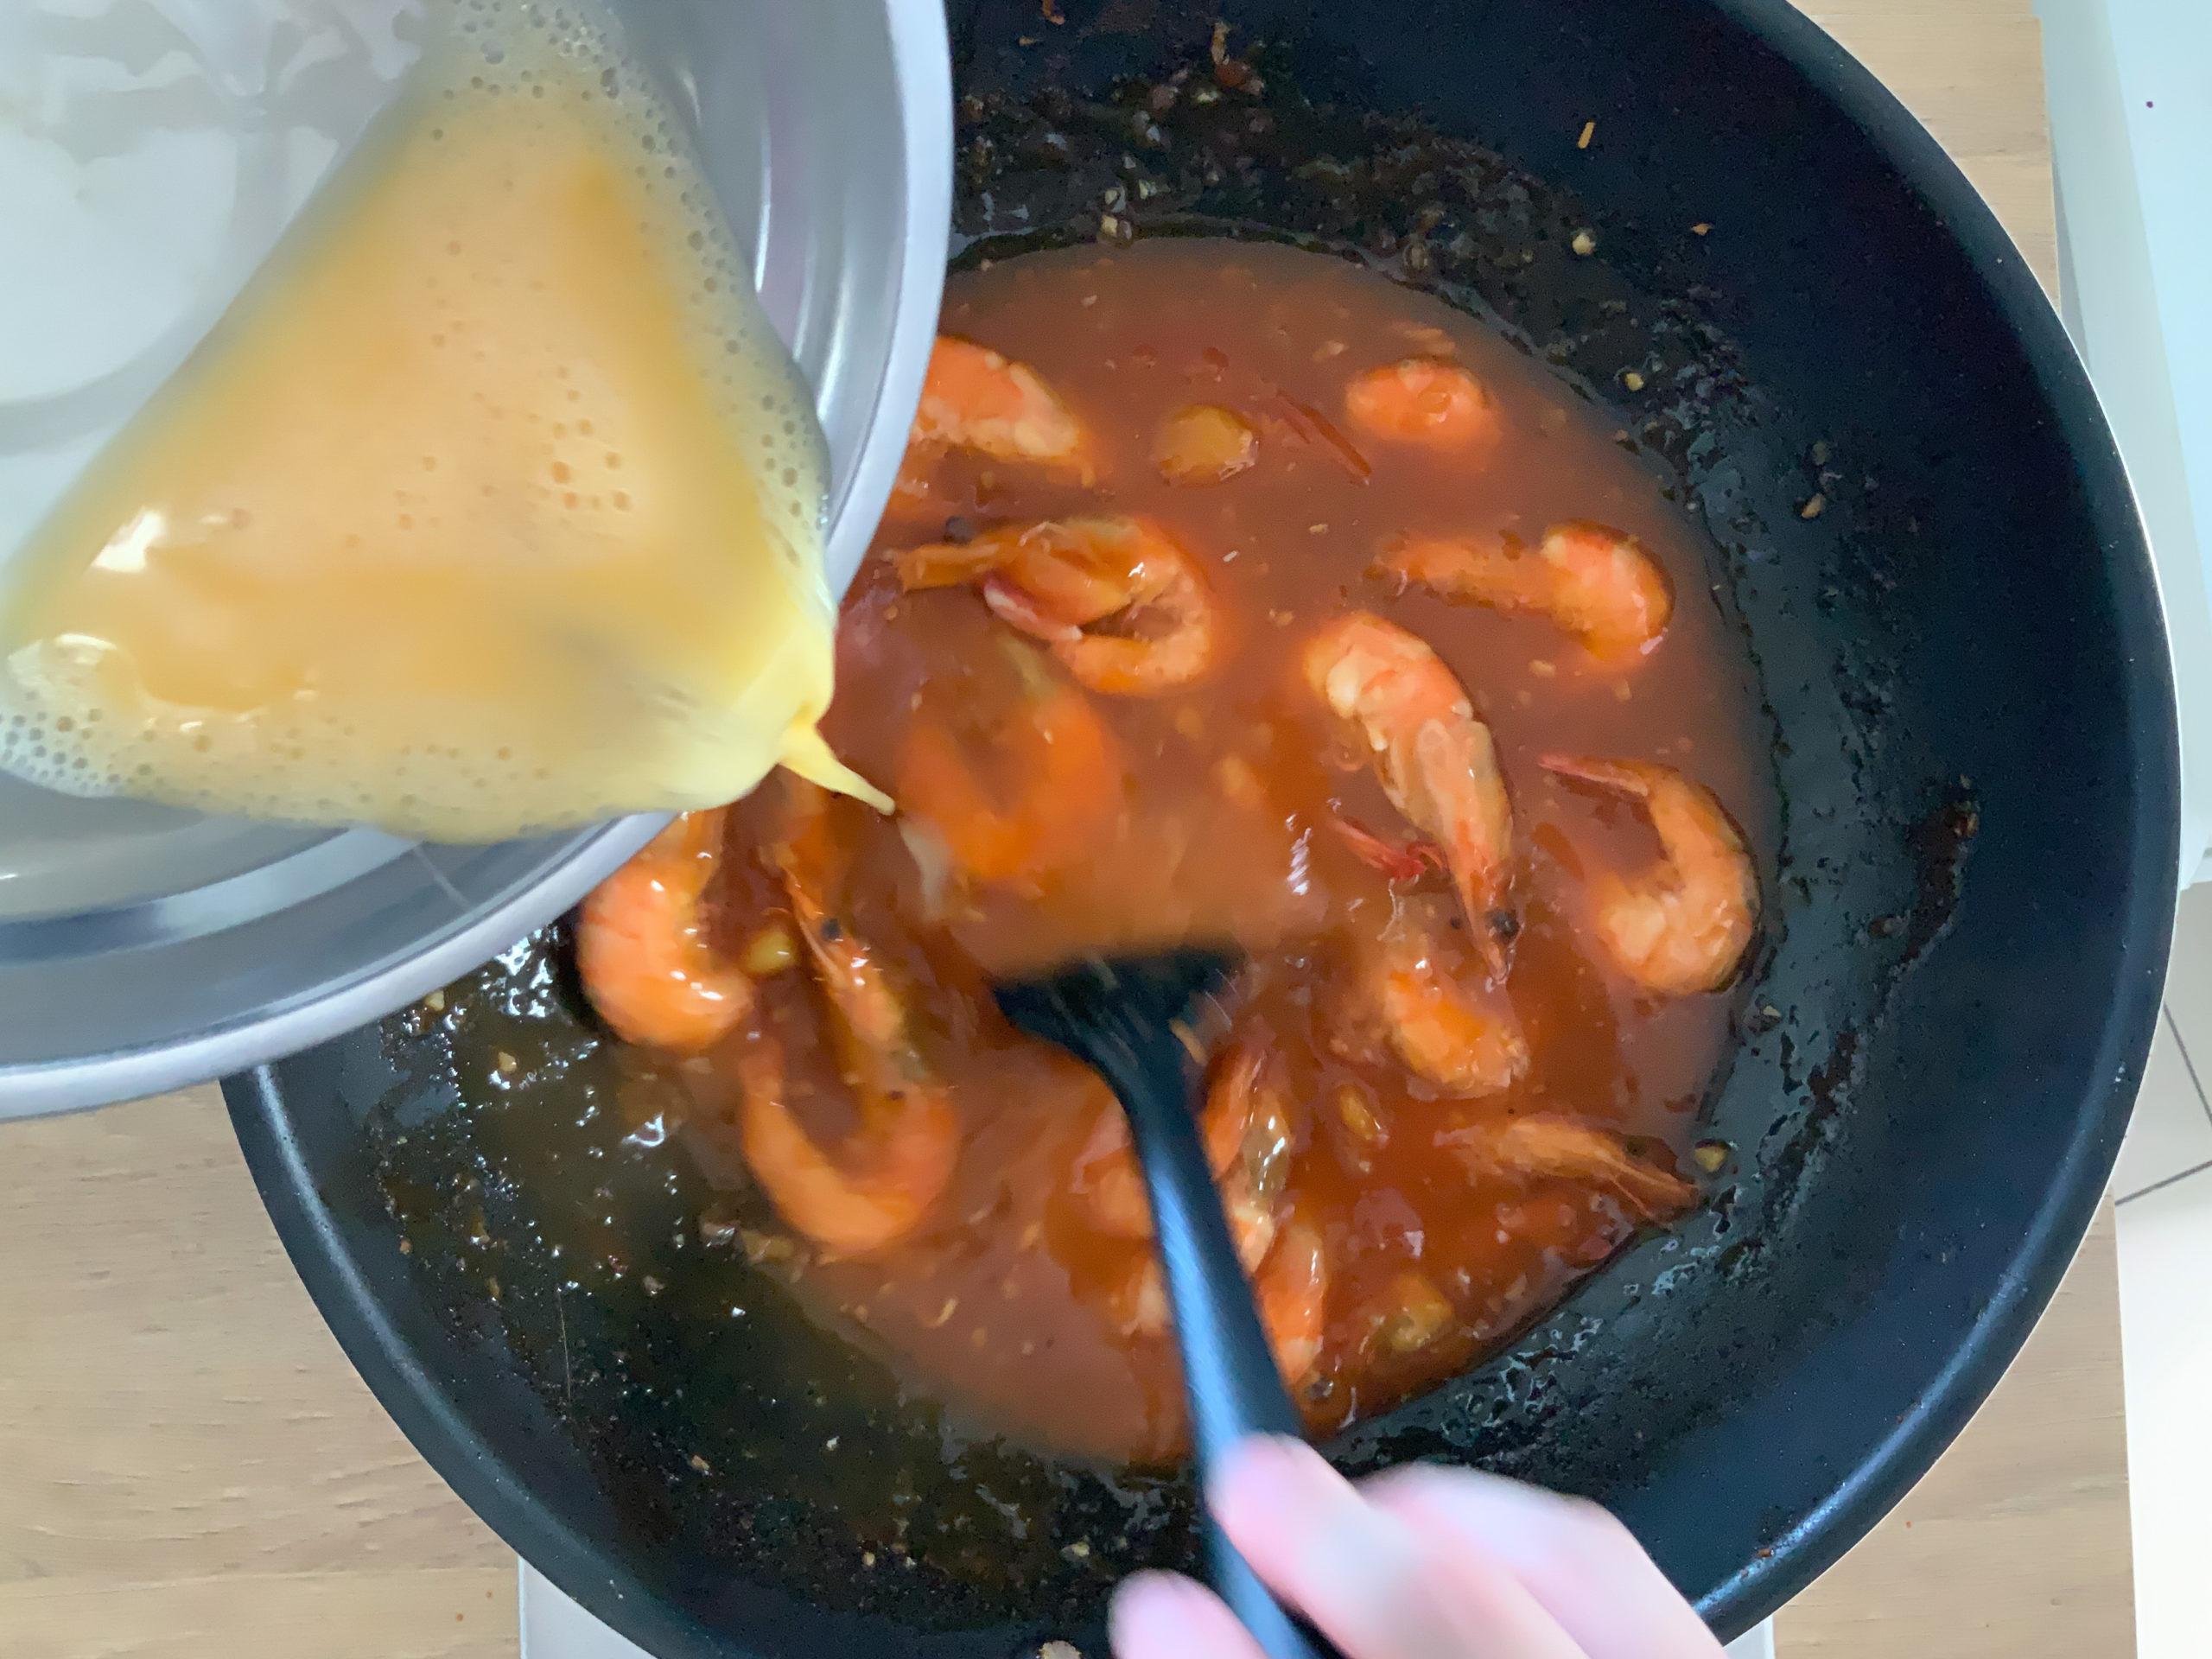 Add in the beaten egg.